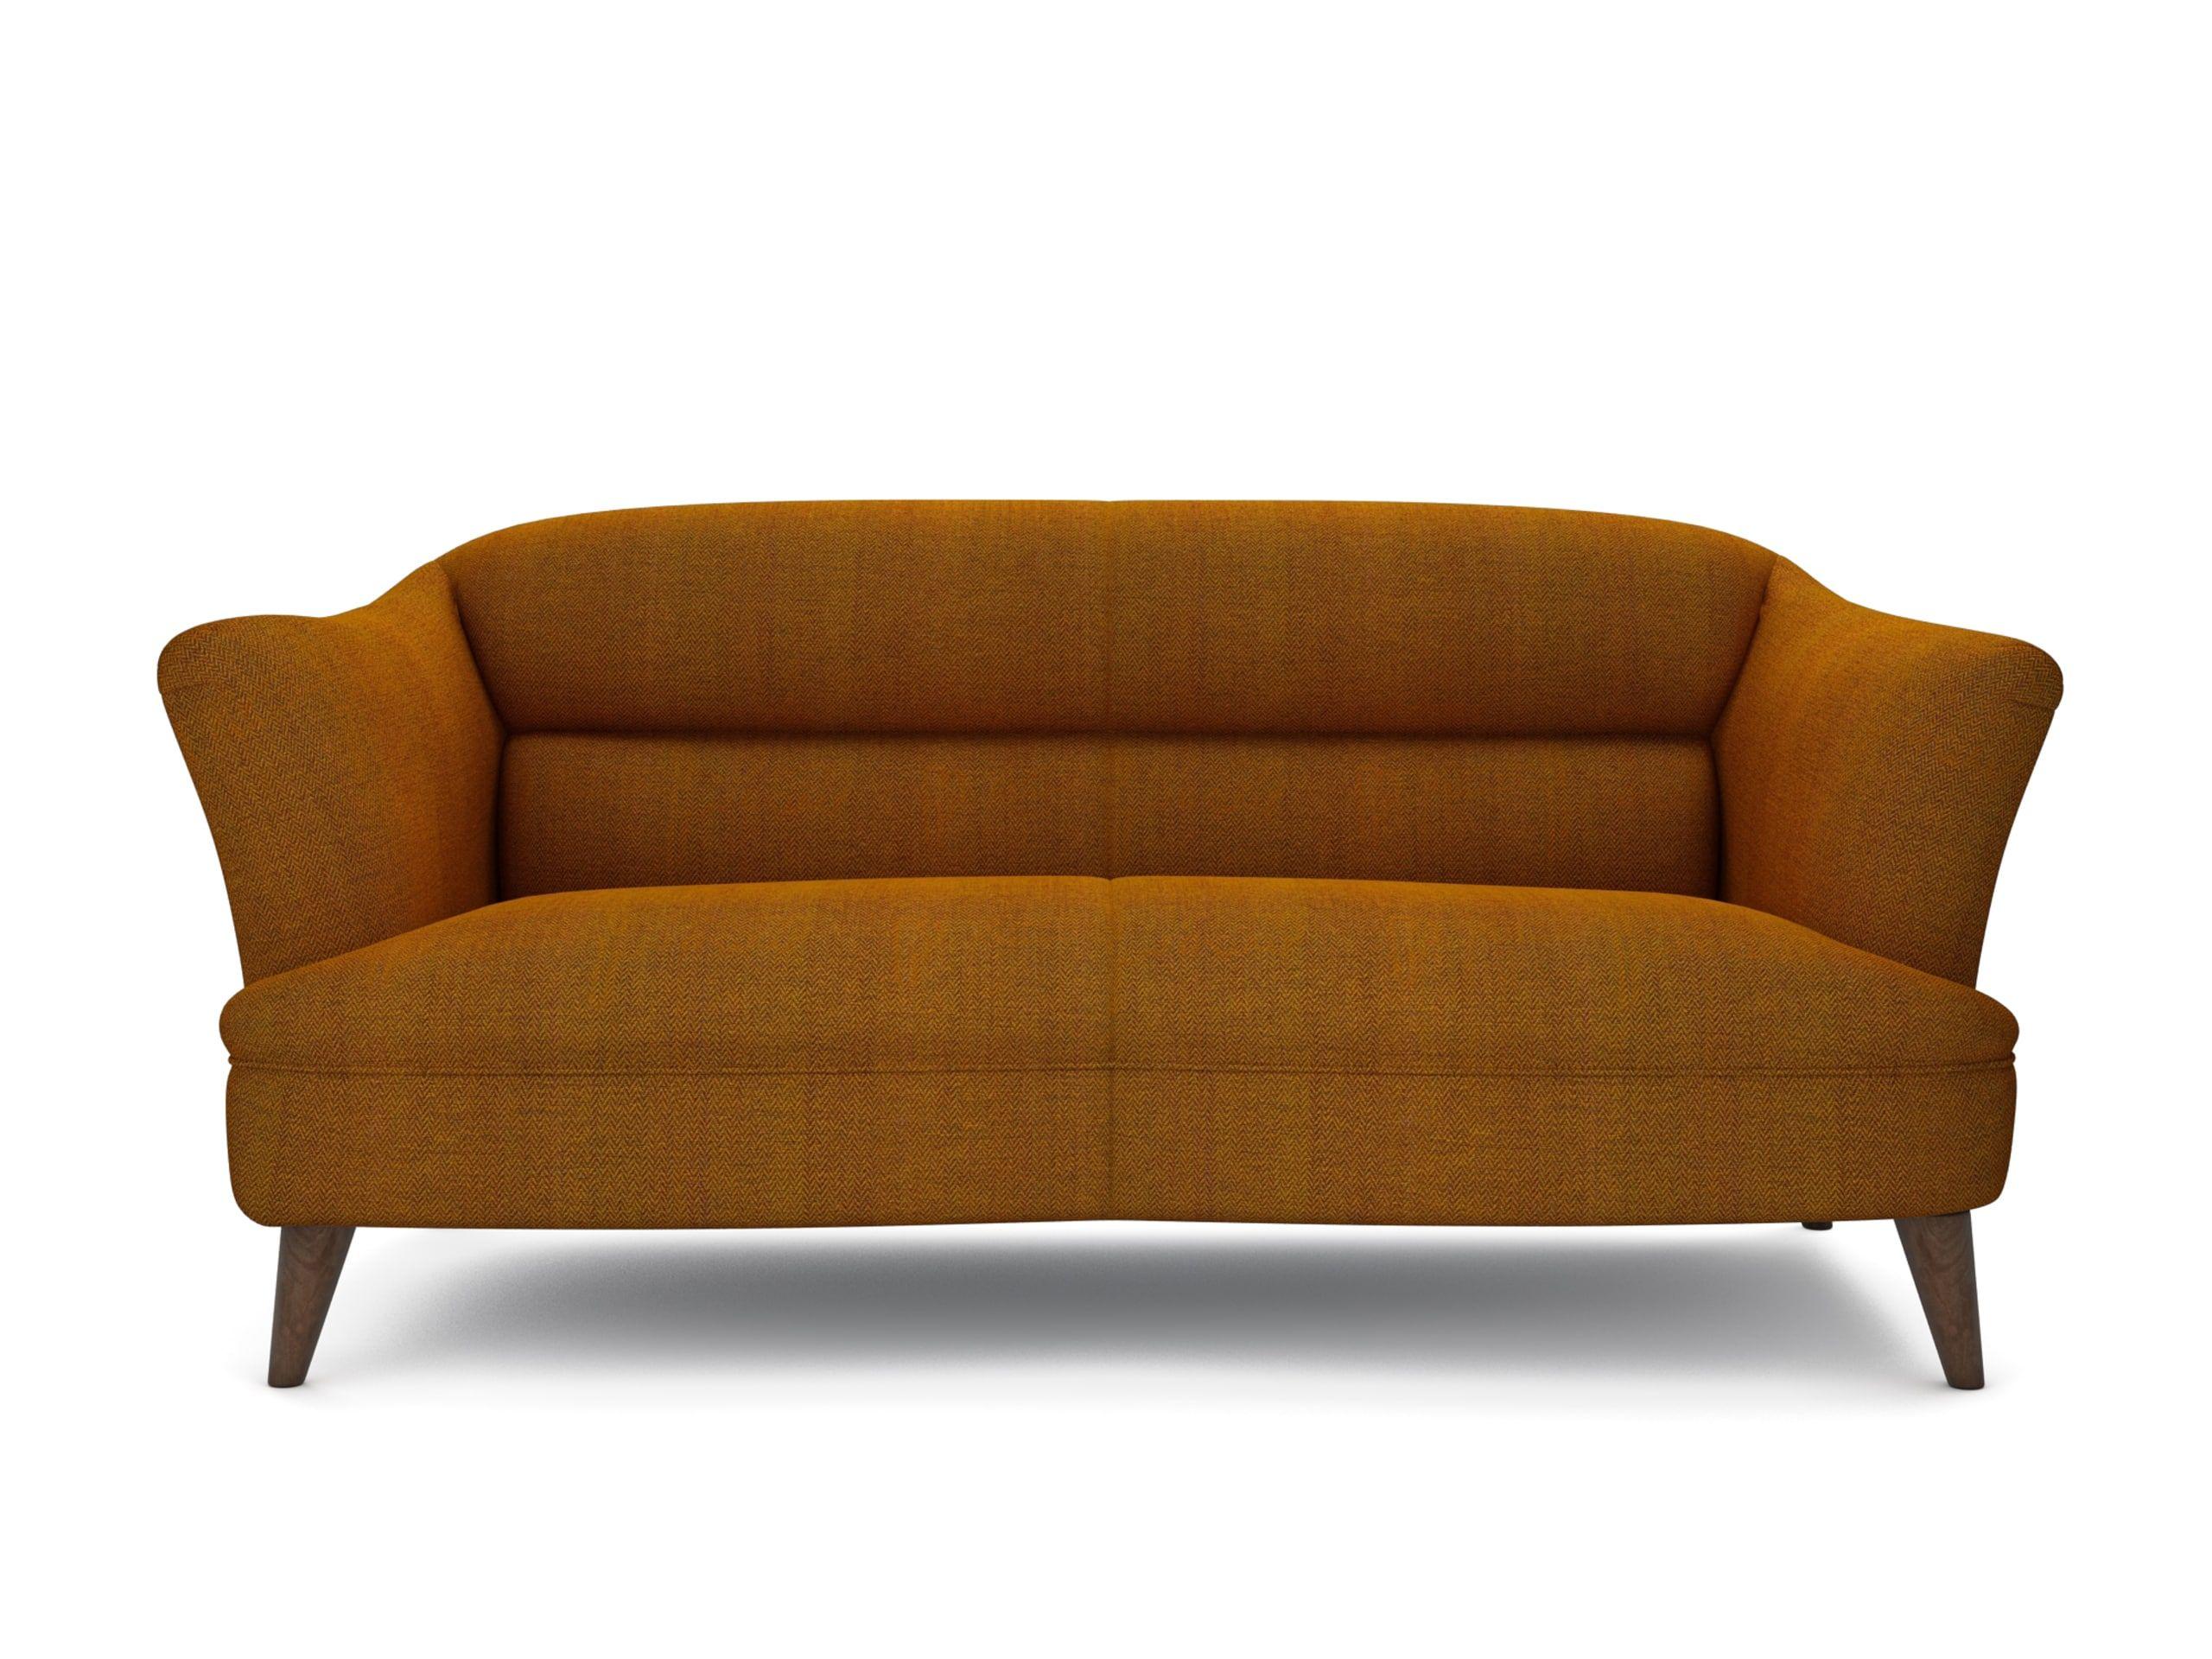 The Lounge Co Willow 25 Seater Sofa in Herringbone Queen Bee